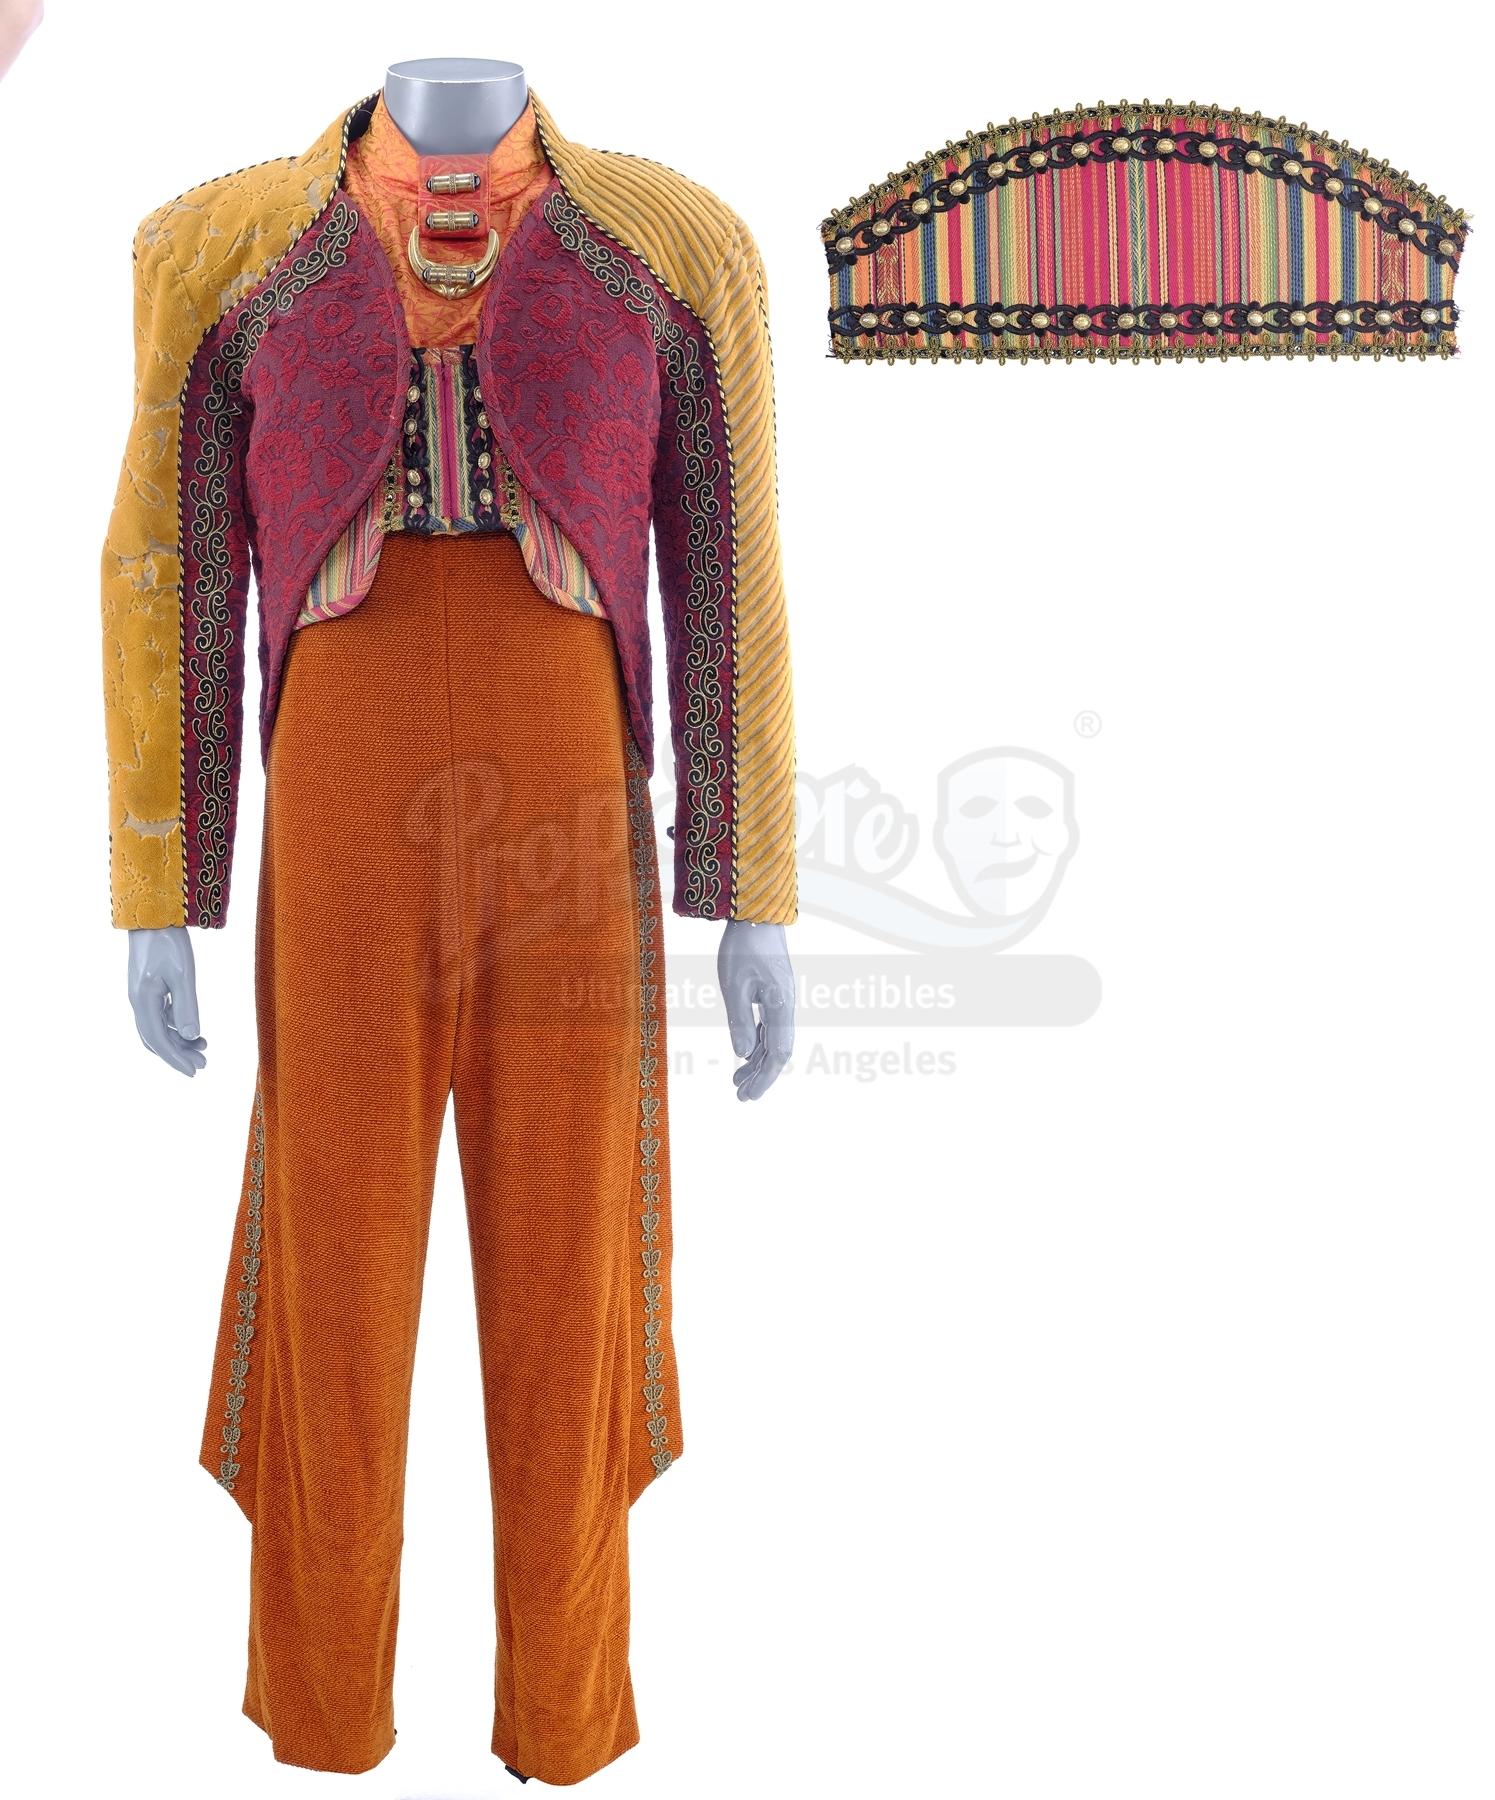 Lot # 249: STAR TREK: DEEP SPACE NINE - Leck the Eliminator's (Hamilton Camp) Costume